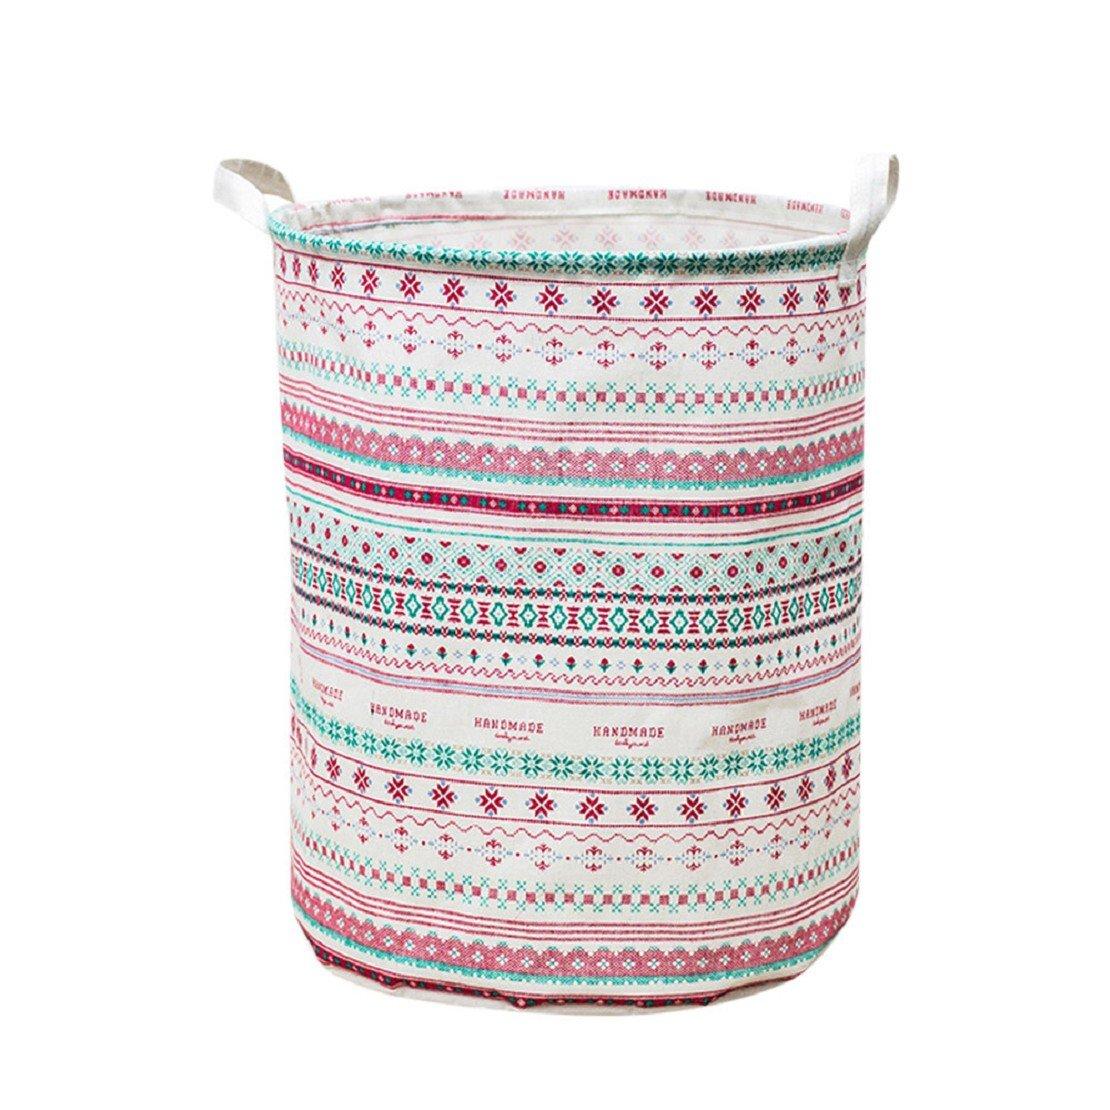 ❤️Amlaiworld Cesta de ropa impermeable del lienzo Cesta de almacenamiento Caja de almacenamiento plegable bolsa de almacenamiento juguetes 42L A, 44 * 35cm